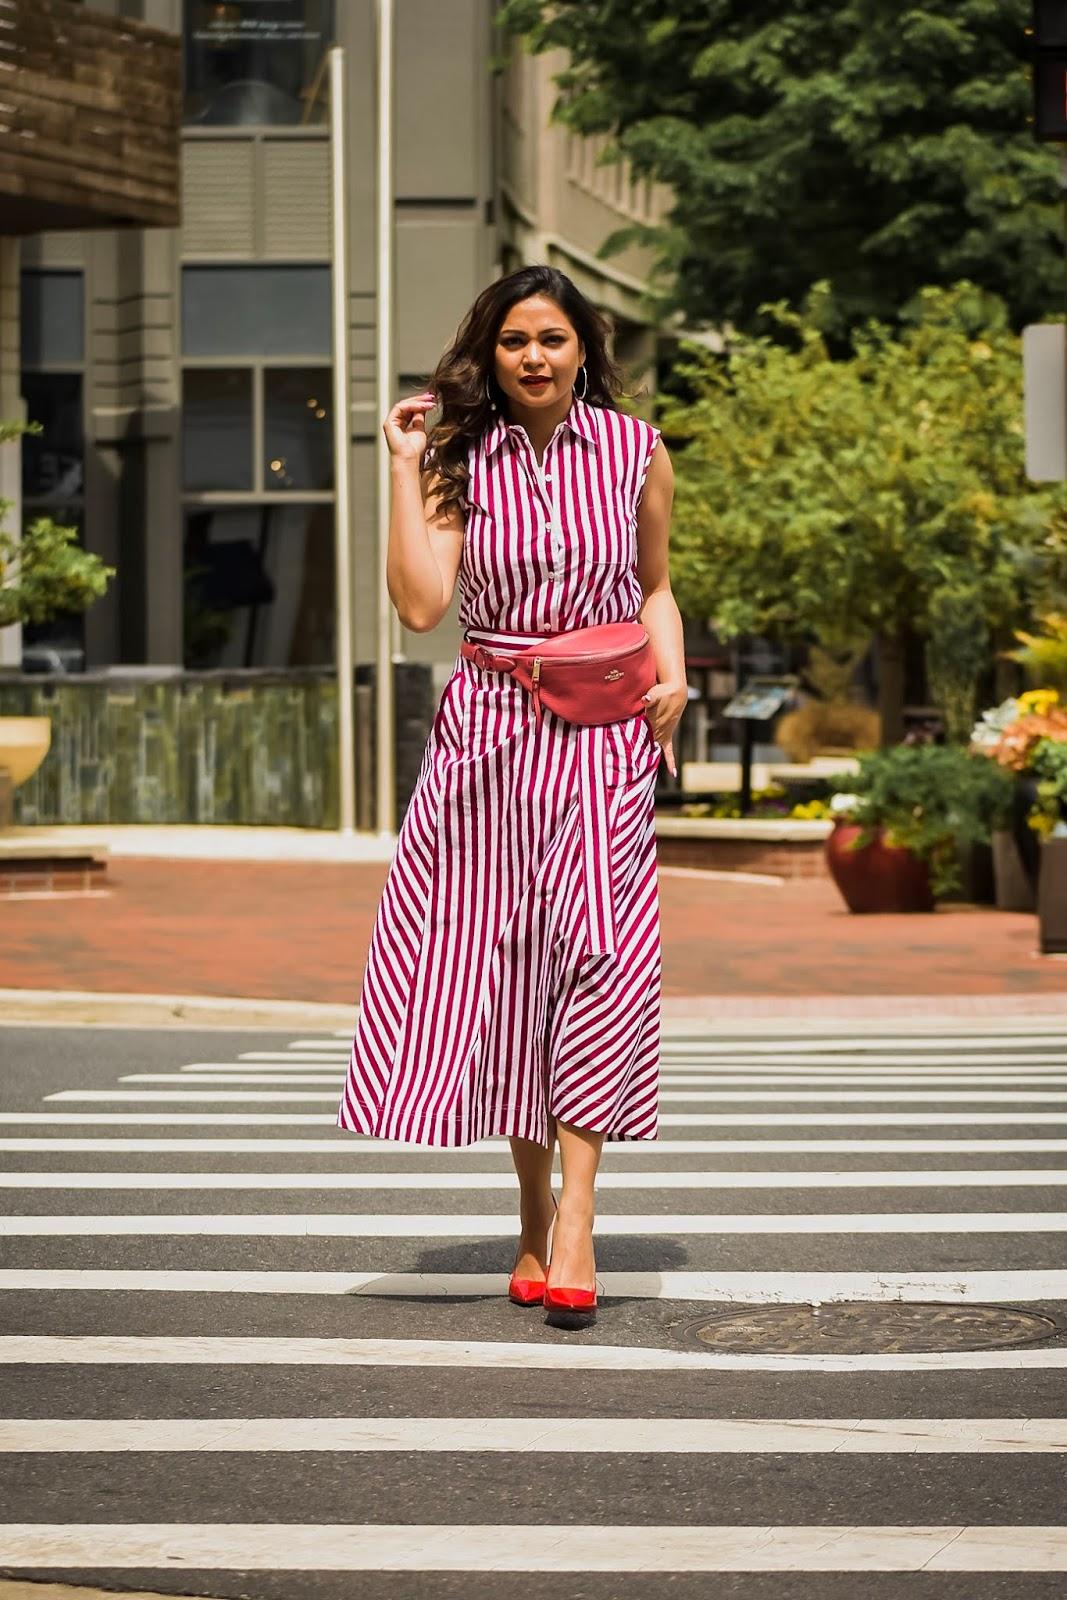 fanny pack, stripe skirt, stripe top, print on print, ootd, street style, fashion, how to wear a fanny pack, cross body belt bag, myriad musings